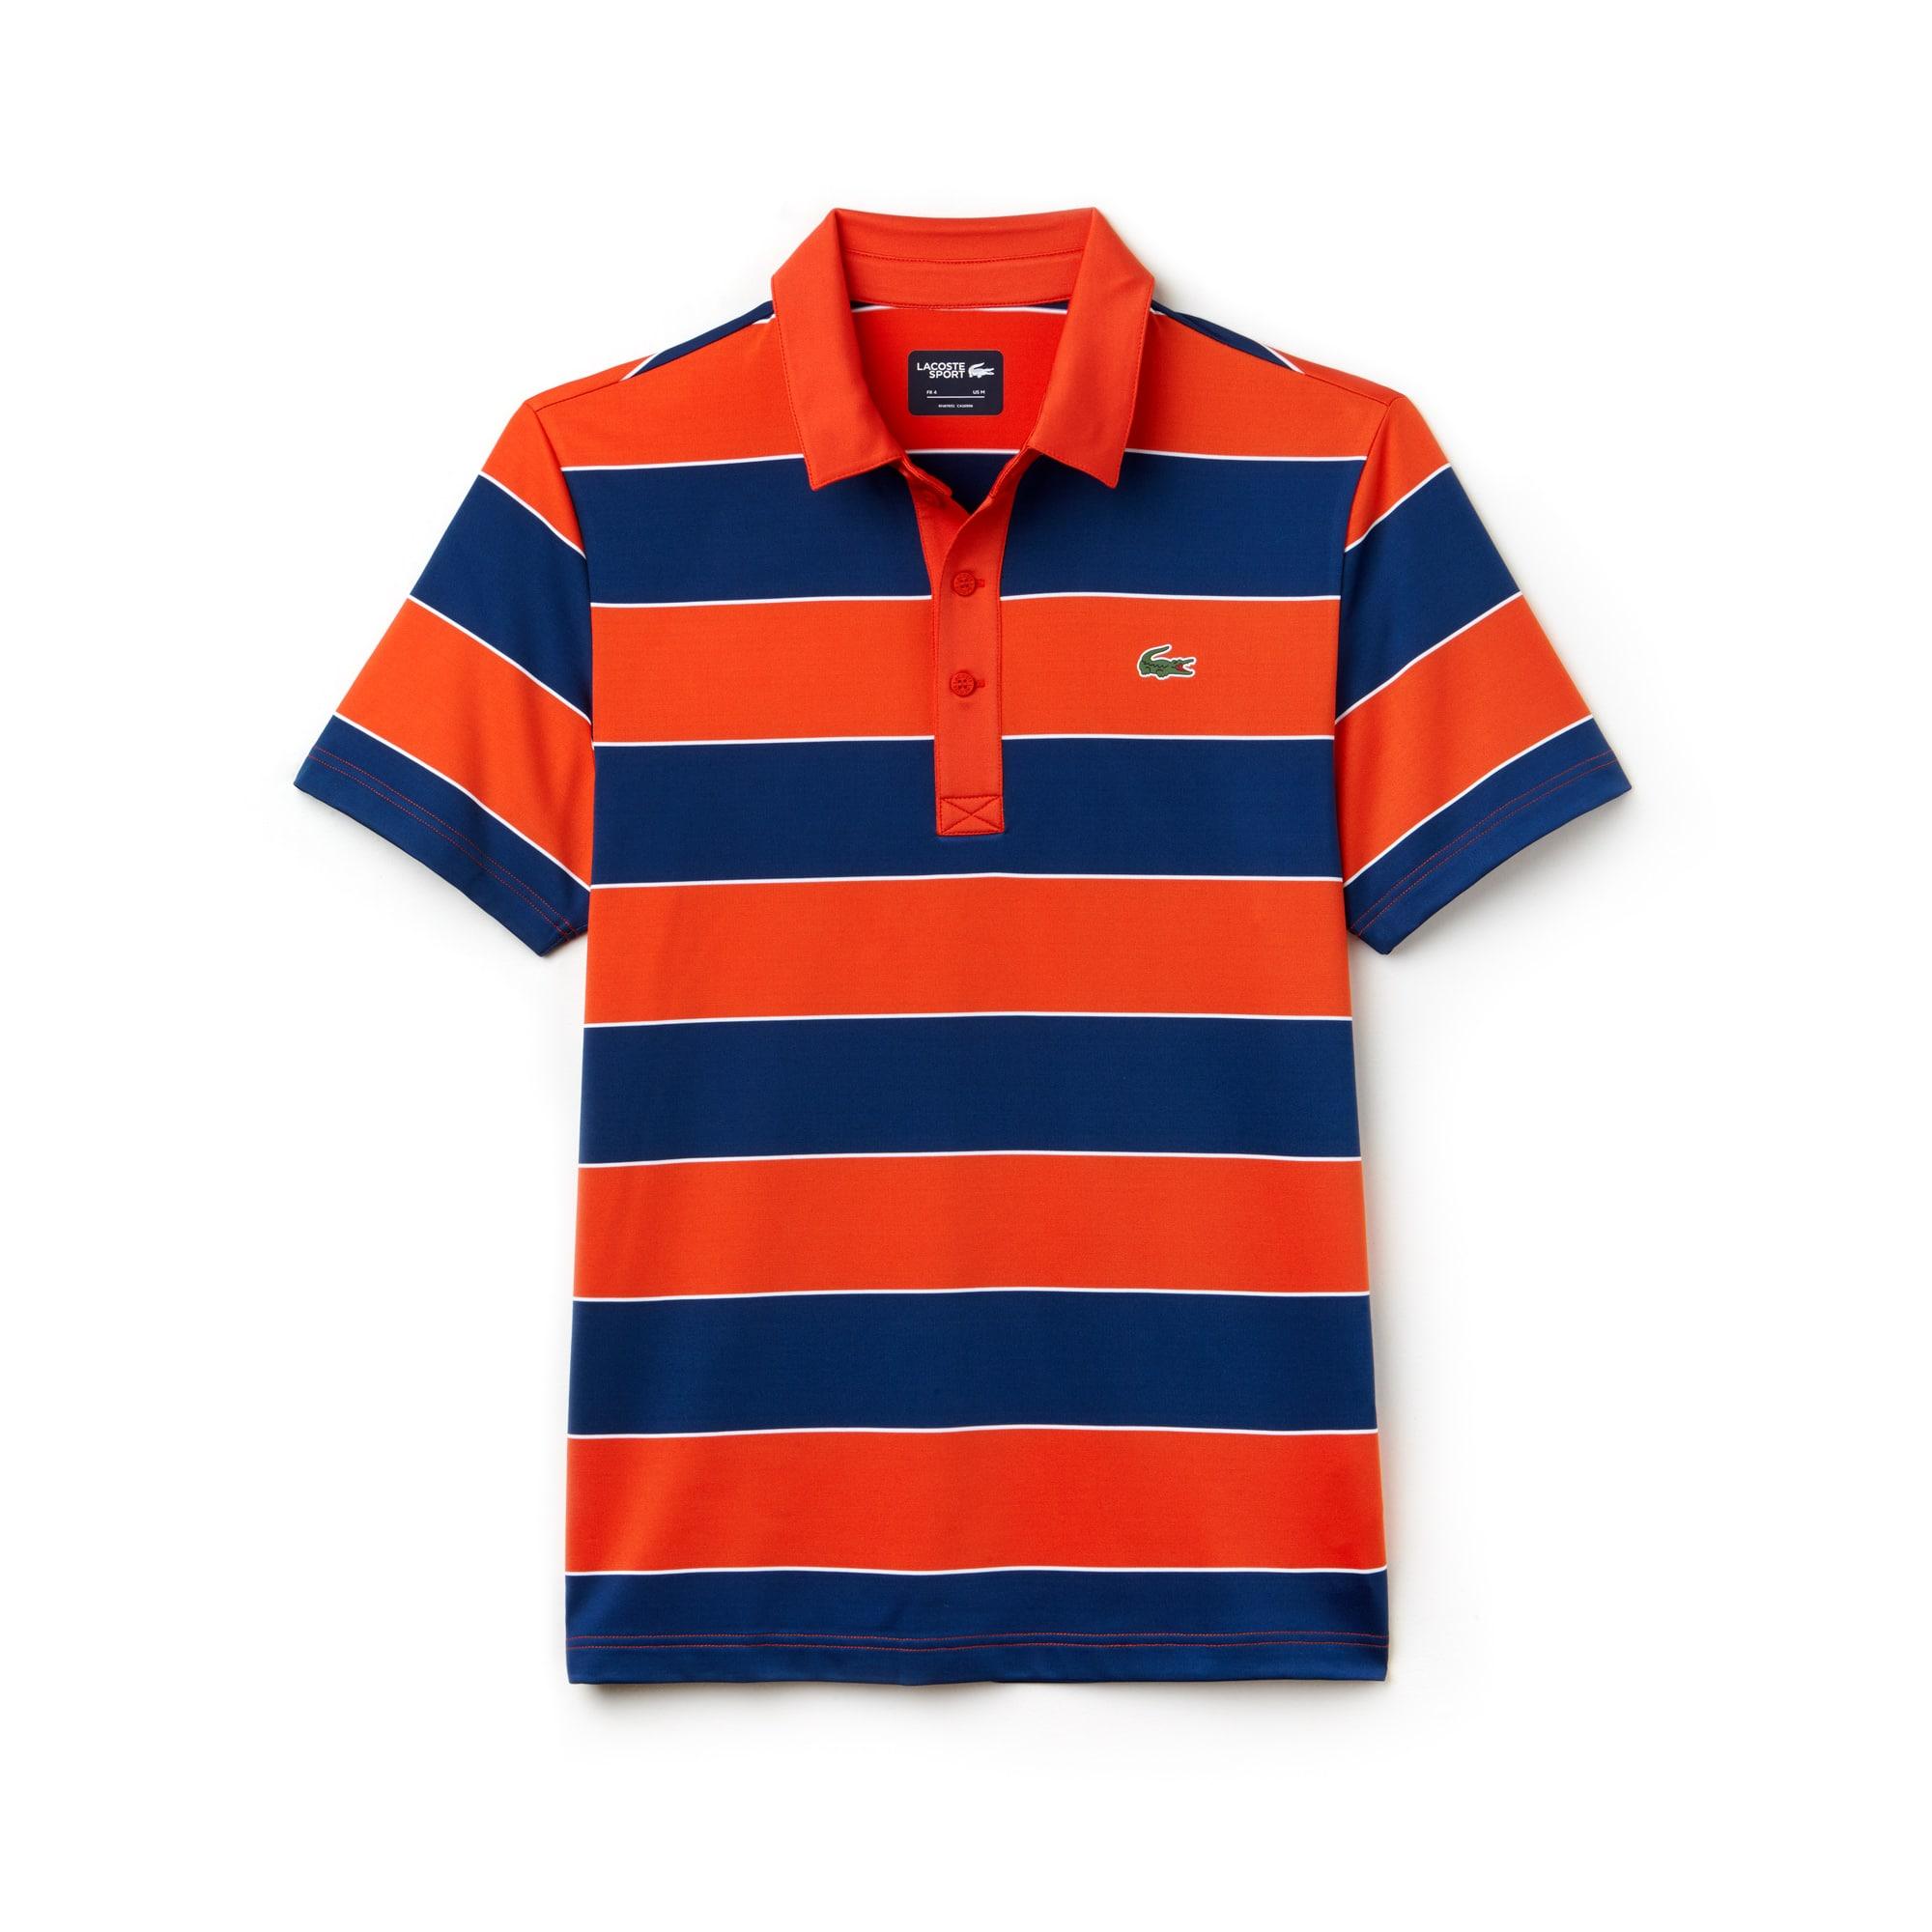 Lacoste - Herren LACOSTE SPORT gestreiftes Golf-Poloshirt aus Jersey - 3